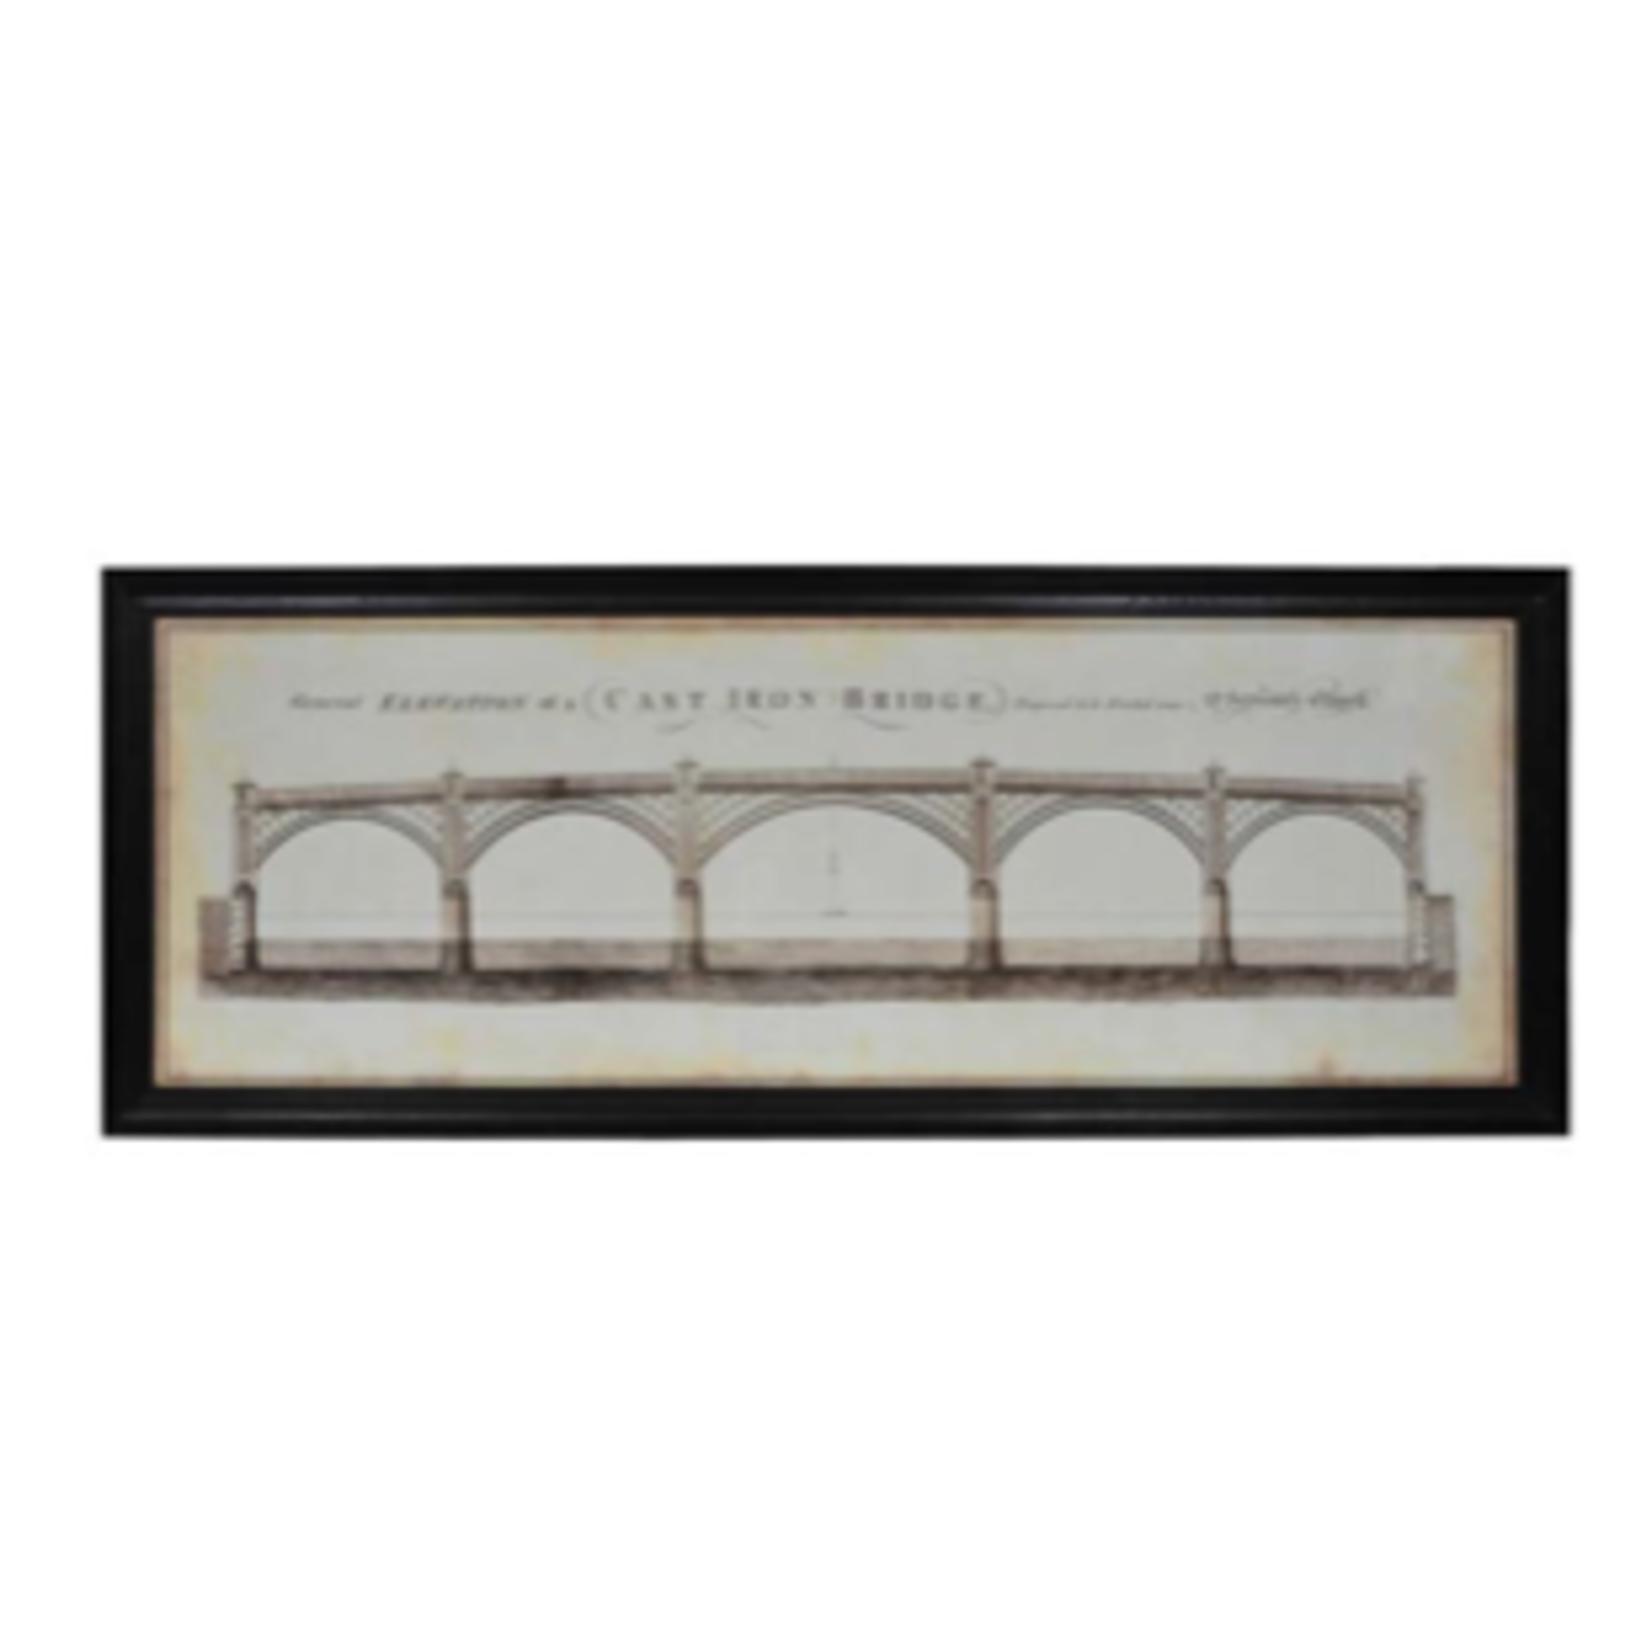 TIMOTHY OULTON ARCHTRL IRON BRIDGE NATURAL LARGE ART